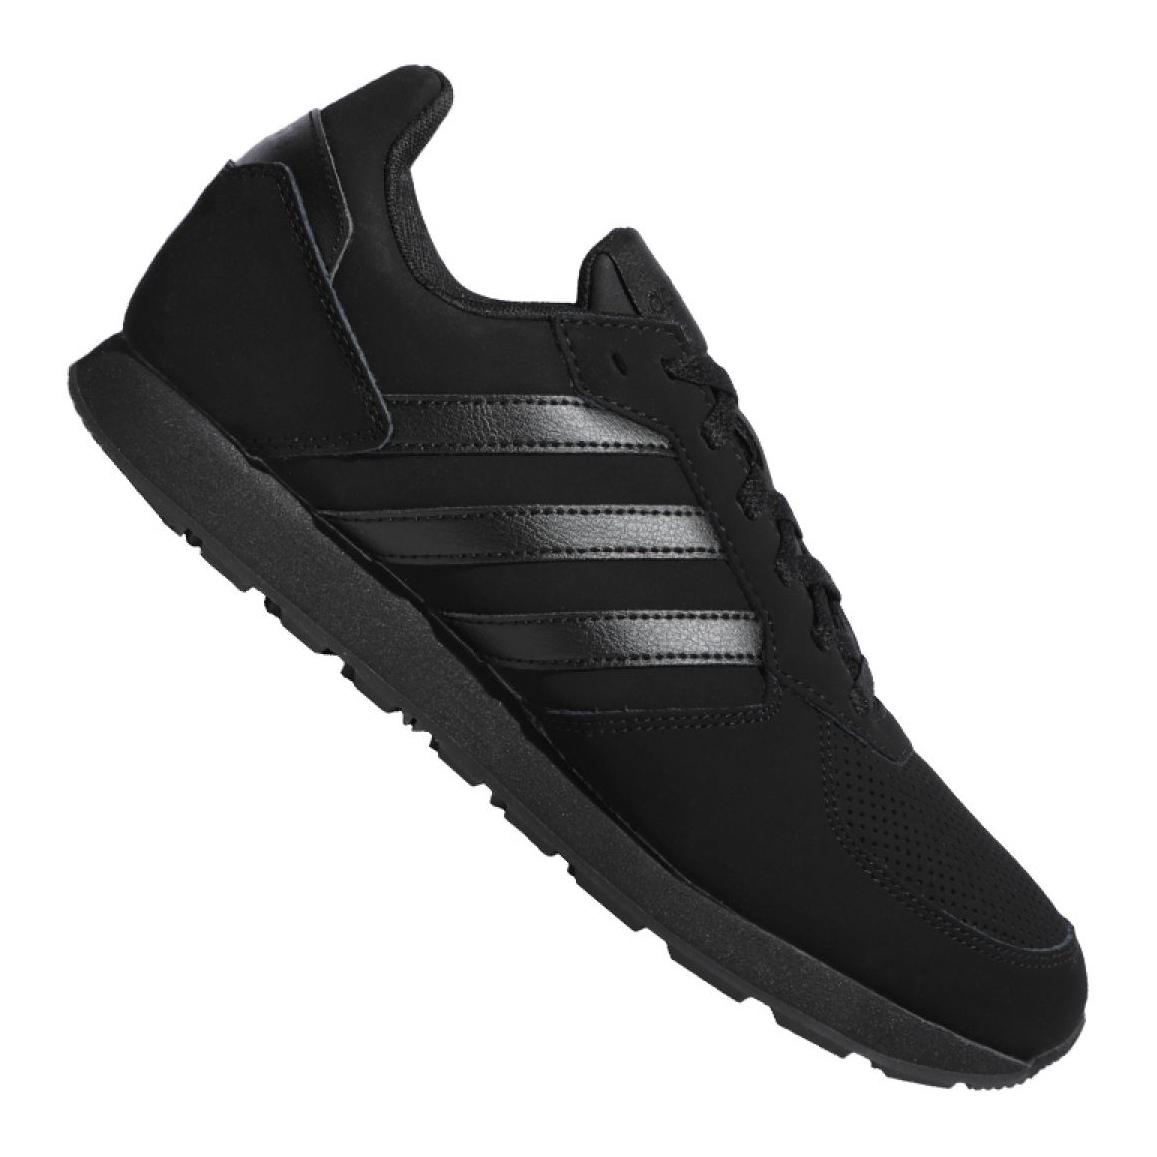 billig Schwarz Adidas 8K M F36889 Schuhe